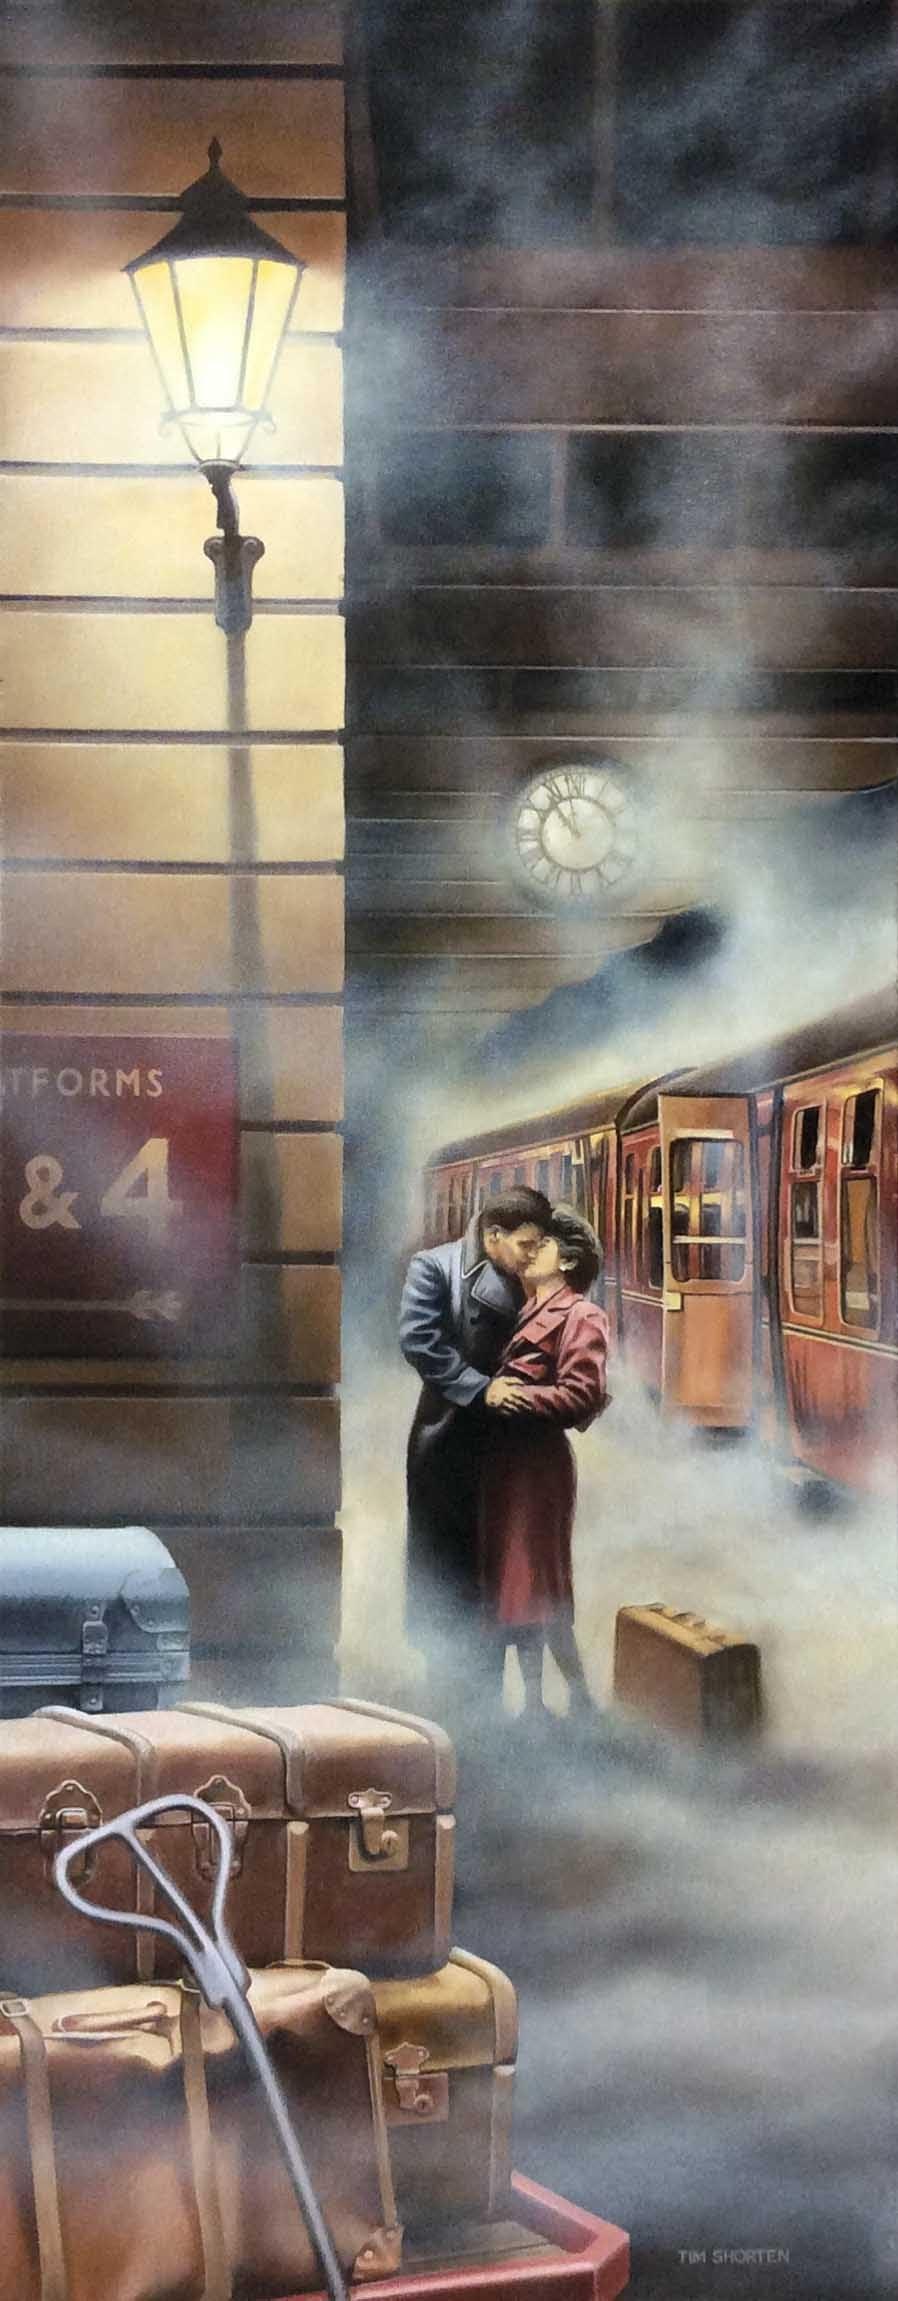 Tim Shorten Kissing couple by train